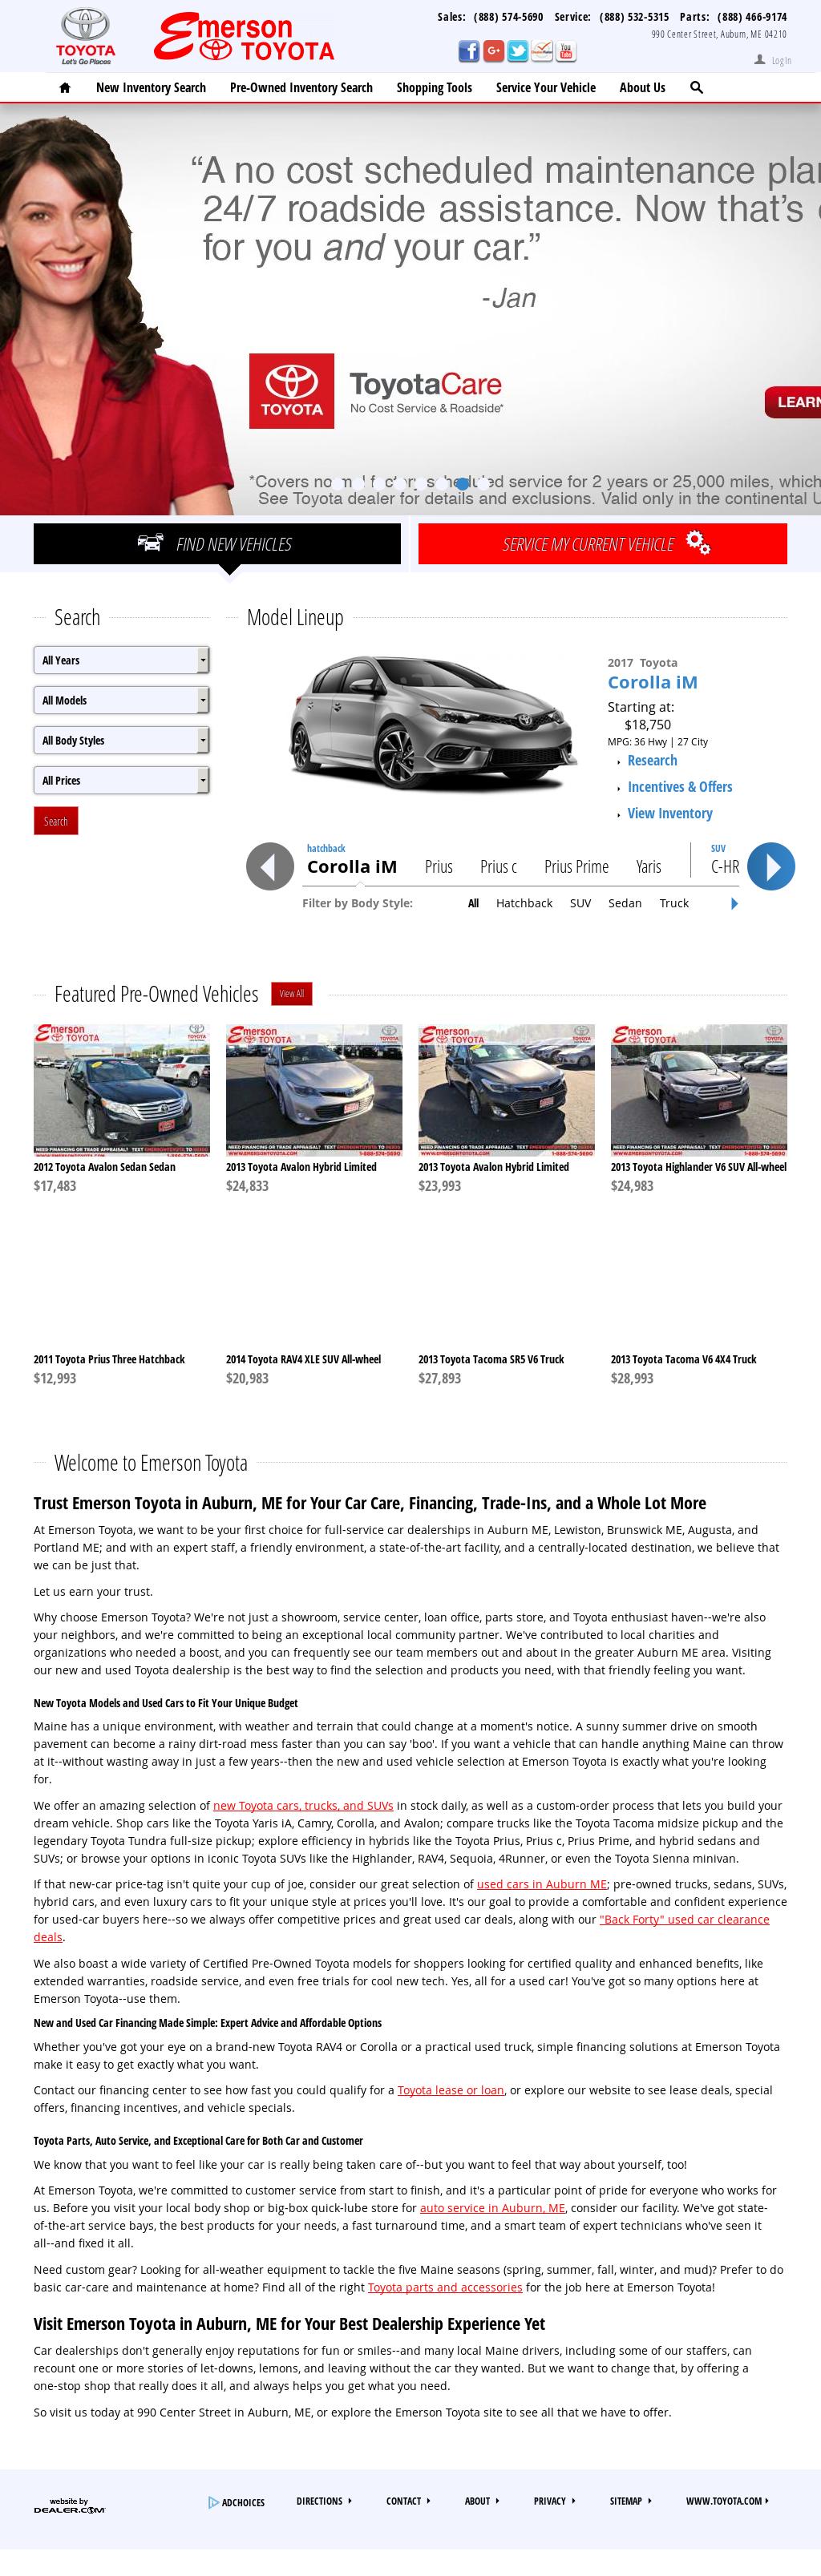 Emerson Toyota Website History